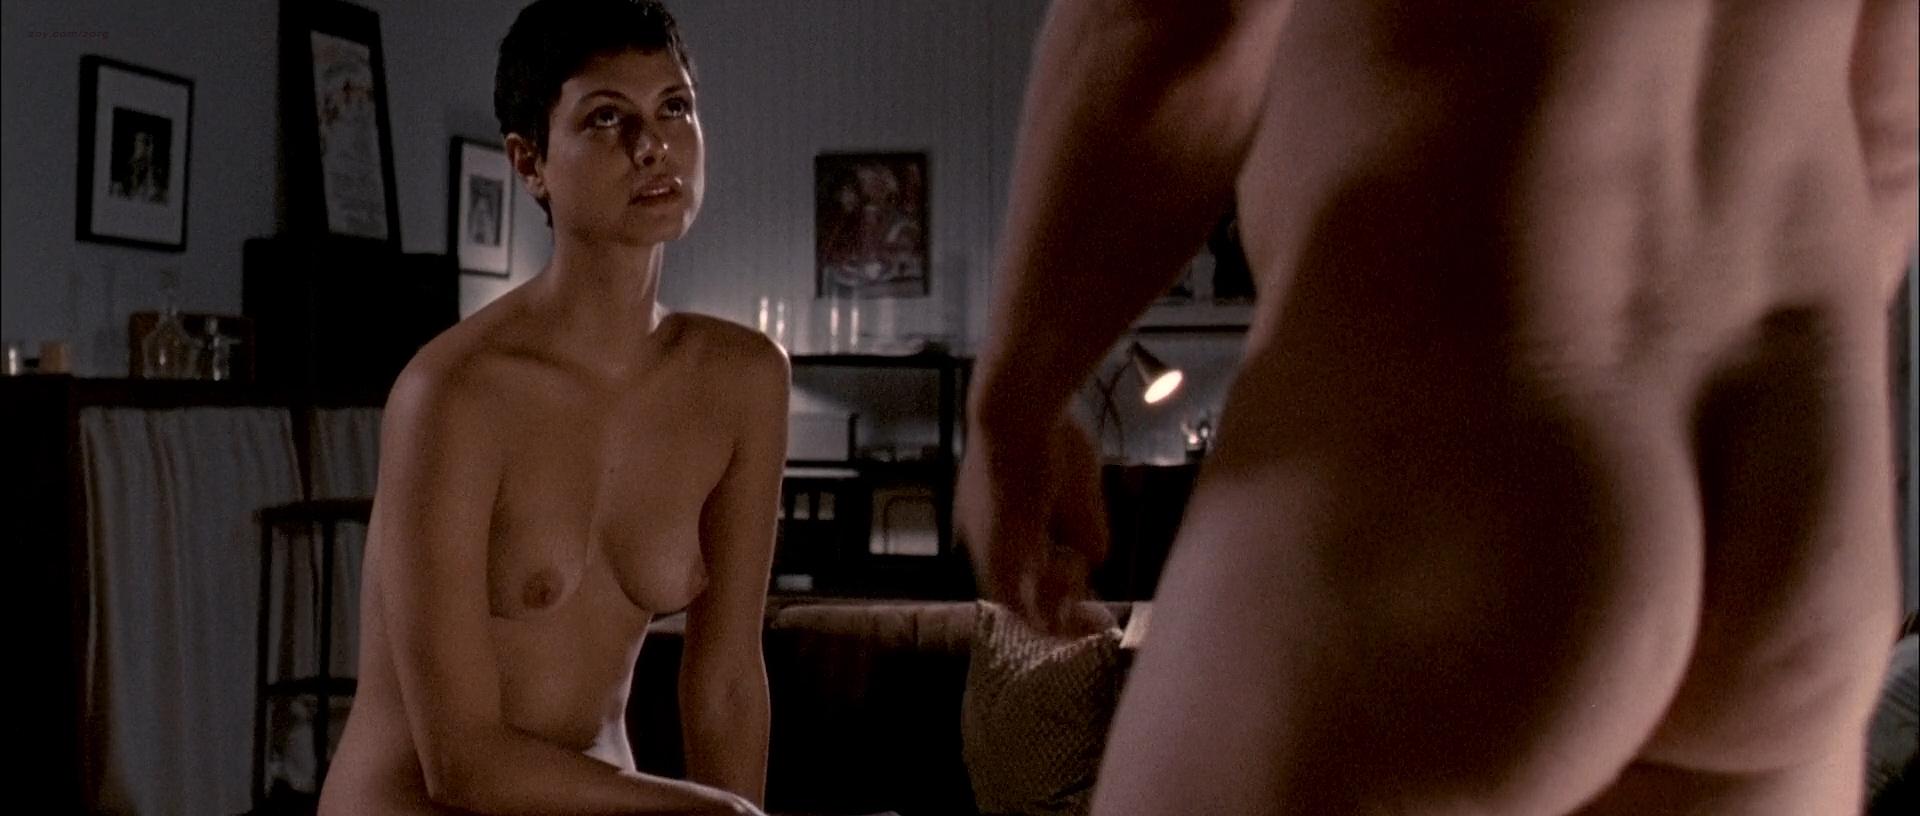 Morena Baccarin nude topless, Vanessa Kai nude sex - Death in Love (2008) hd 1080p Bluray (10)